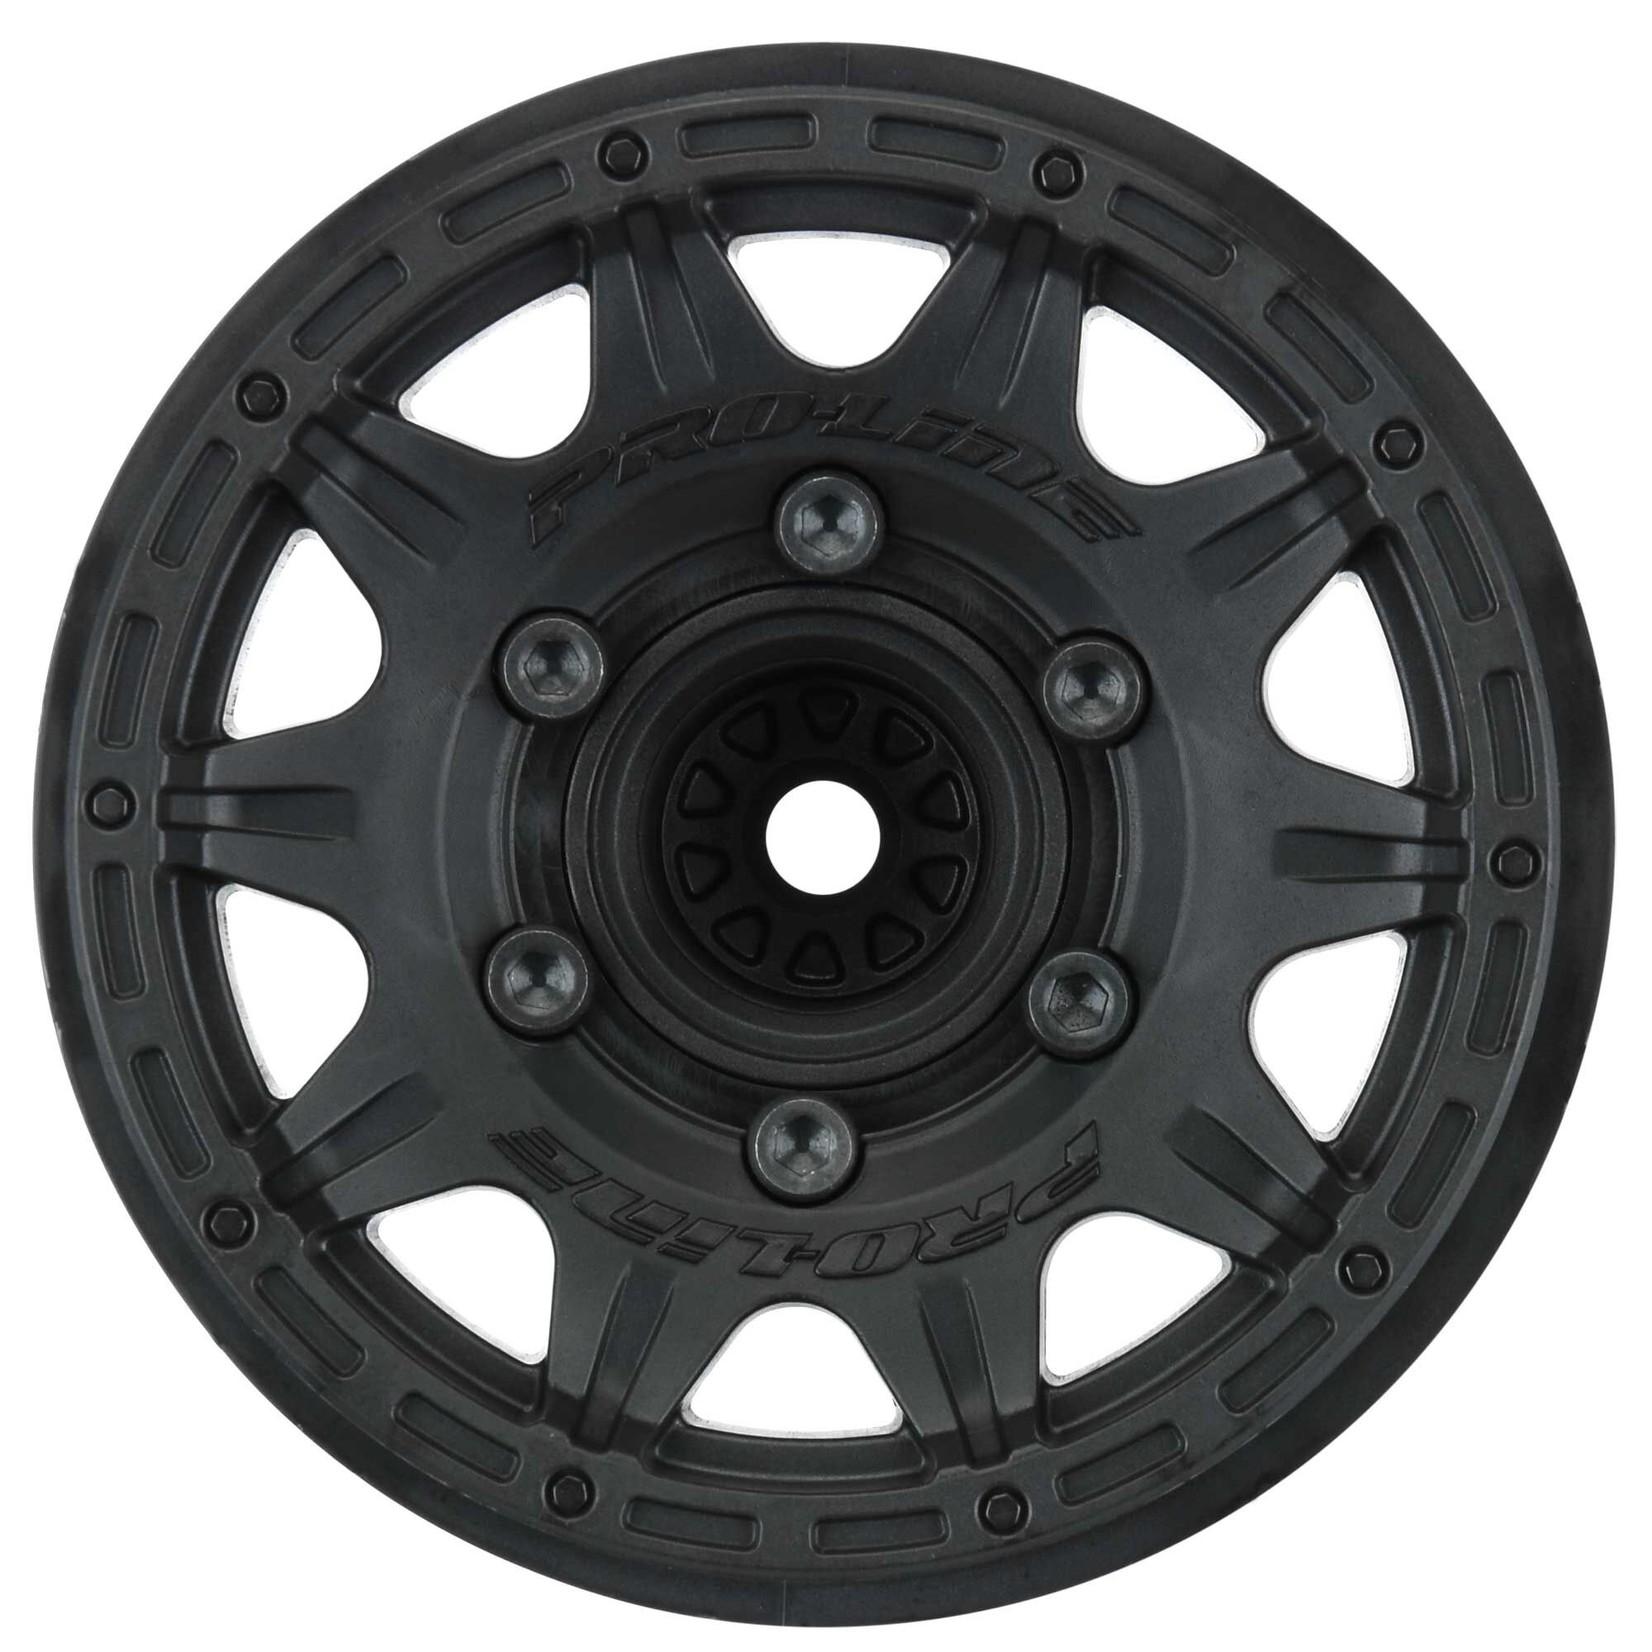 Pro-Line Racing PRO2774-03 Pro-Line Raid 2.8'' Black 6x30 Removable Hex Wheels F/R